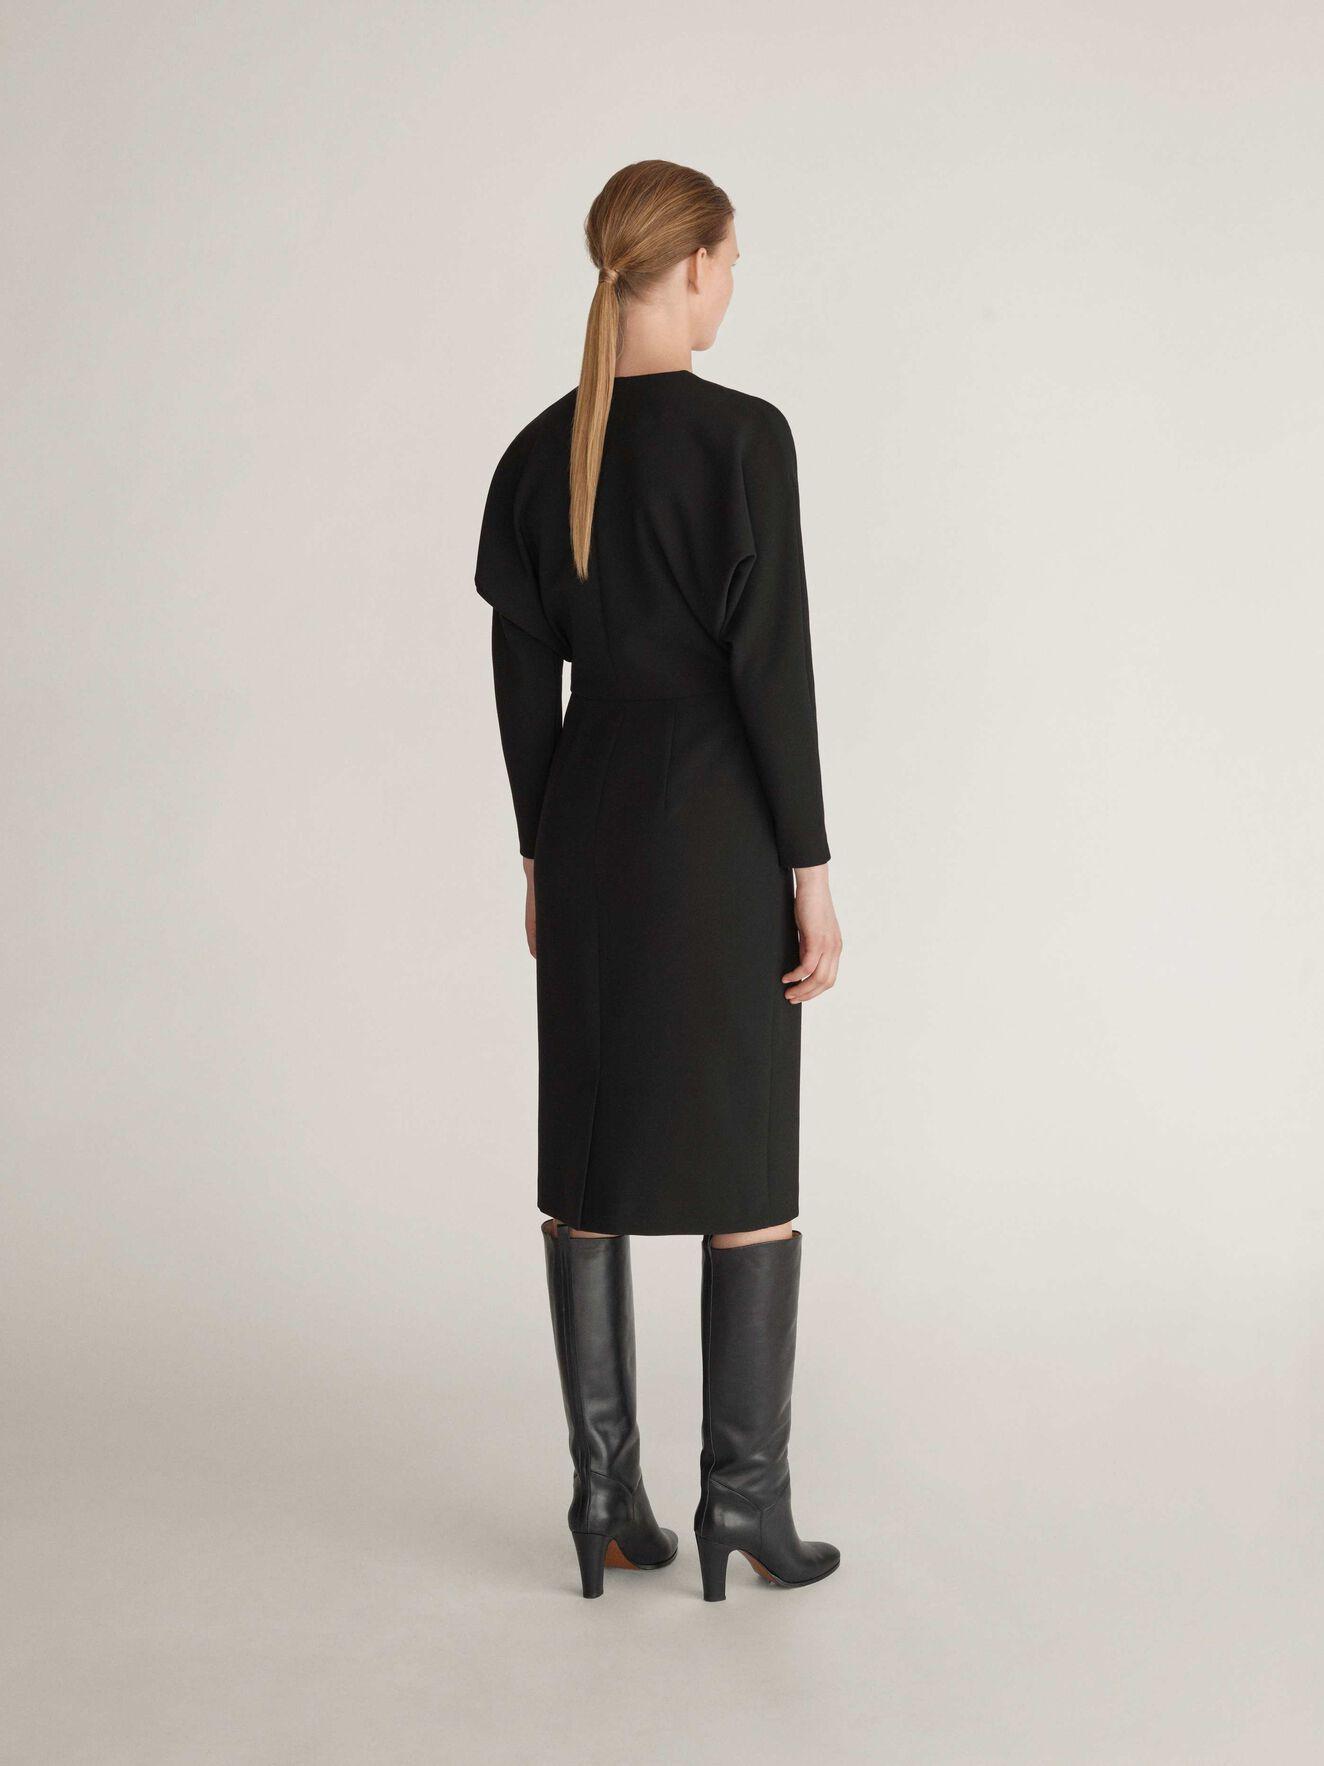 Assulu Dress in Midnight Black from Tiger of Sweden